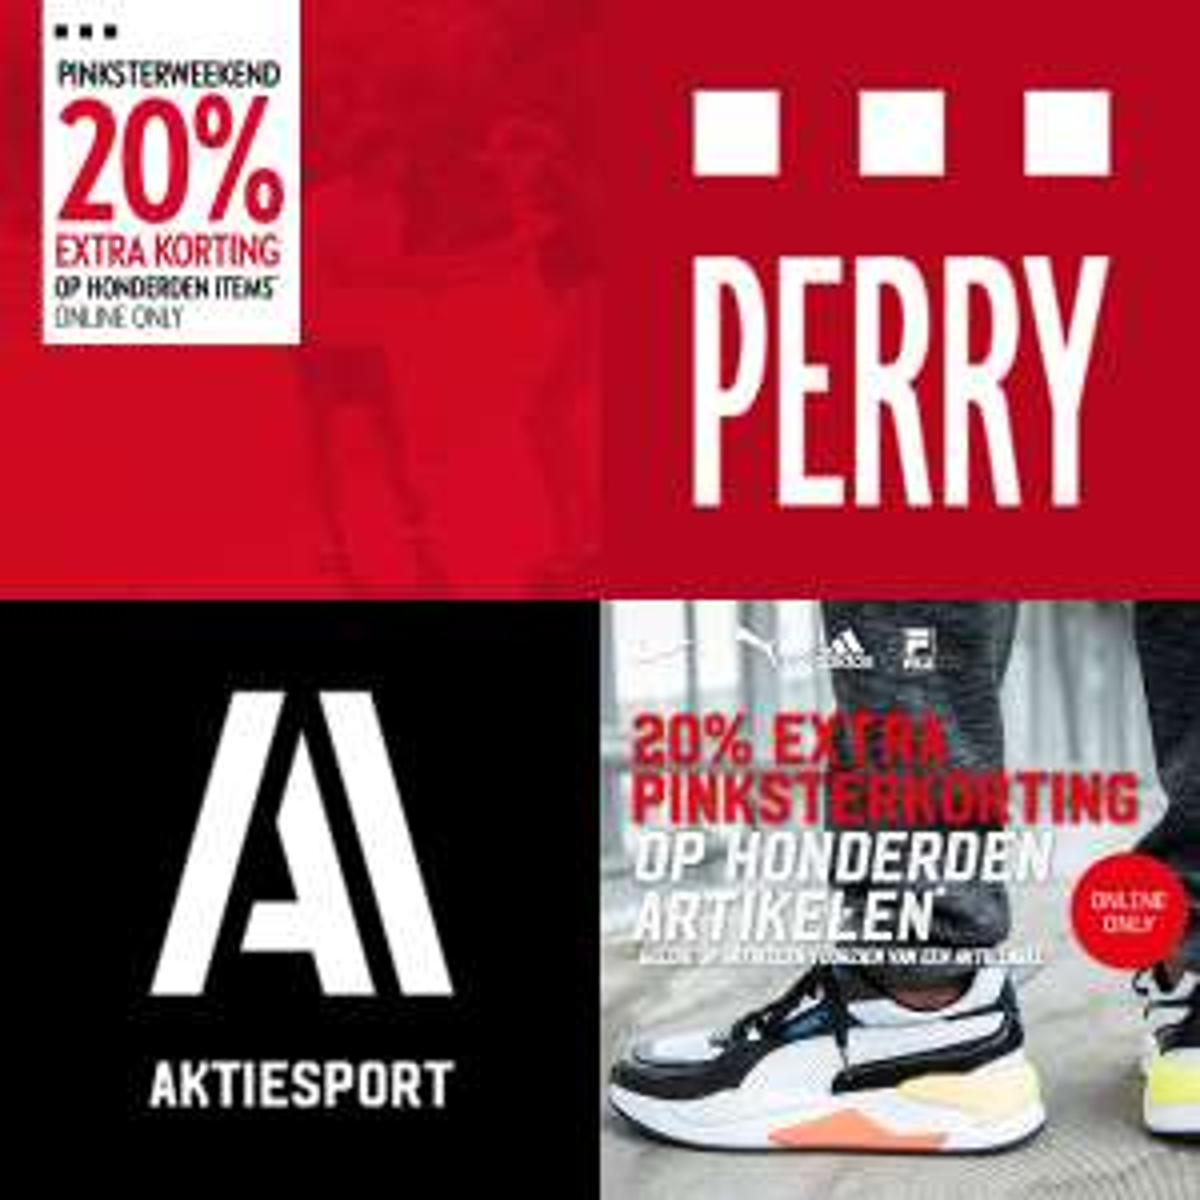 20% [extra] korting @ Perry / Aktiesport